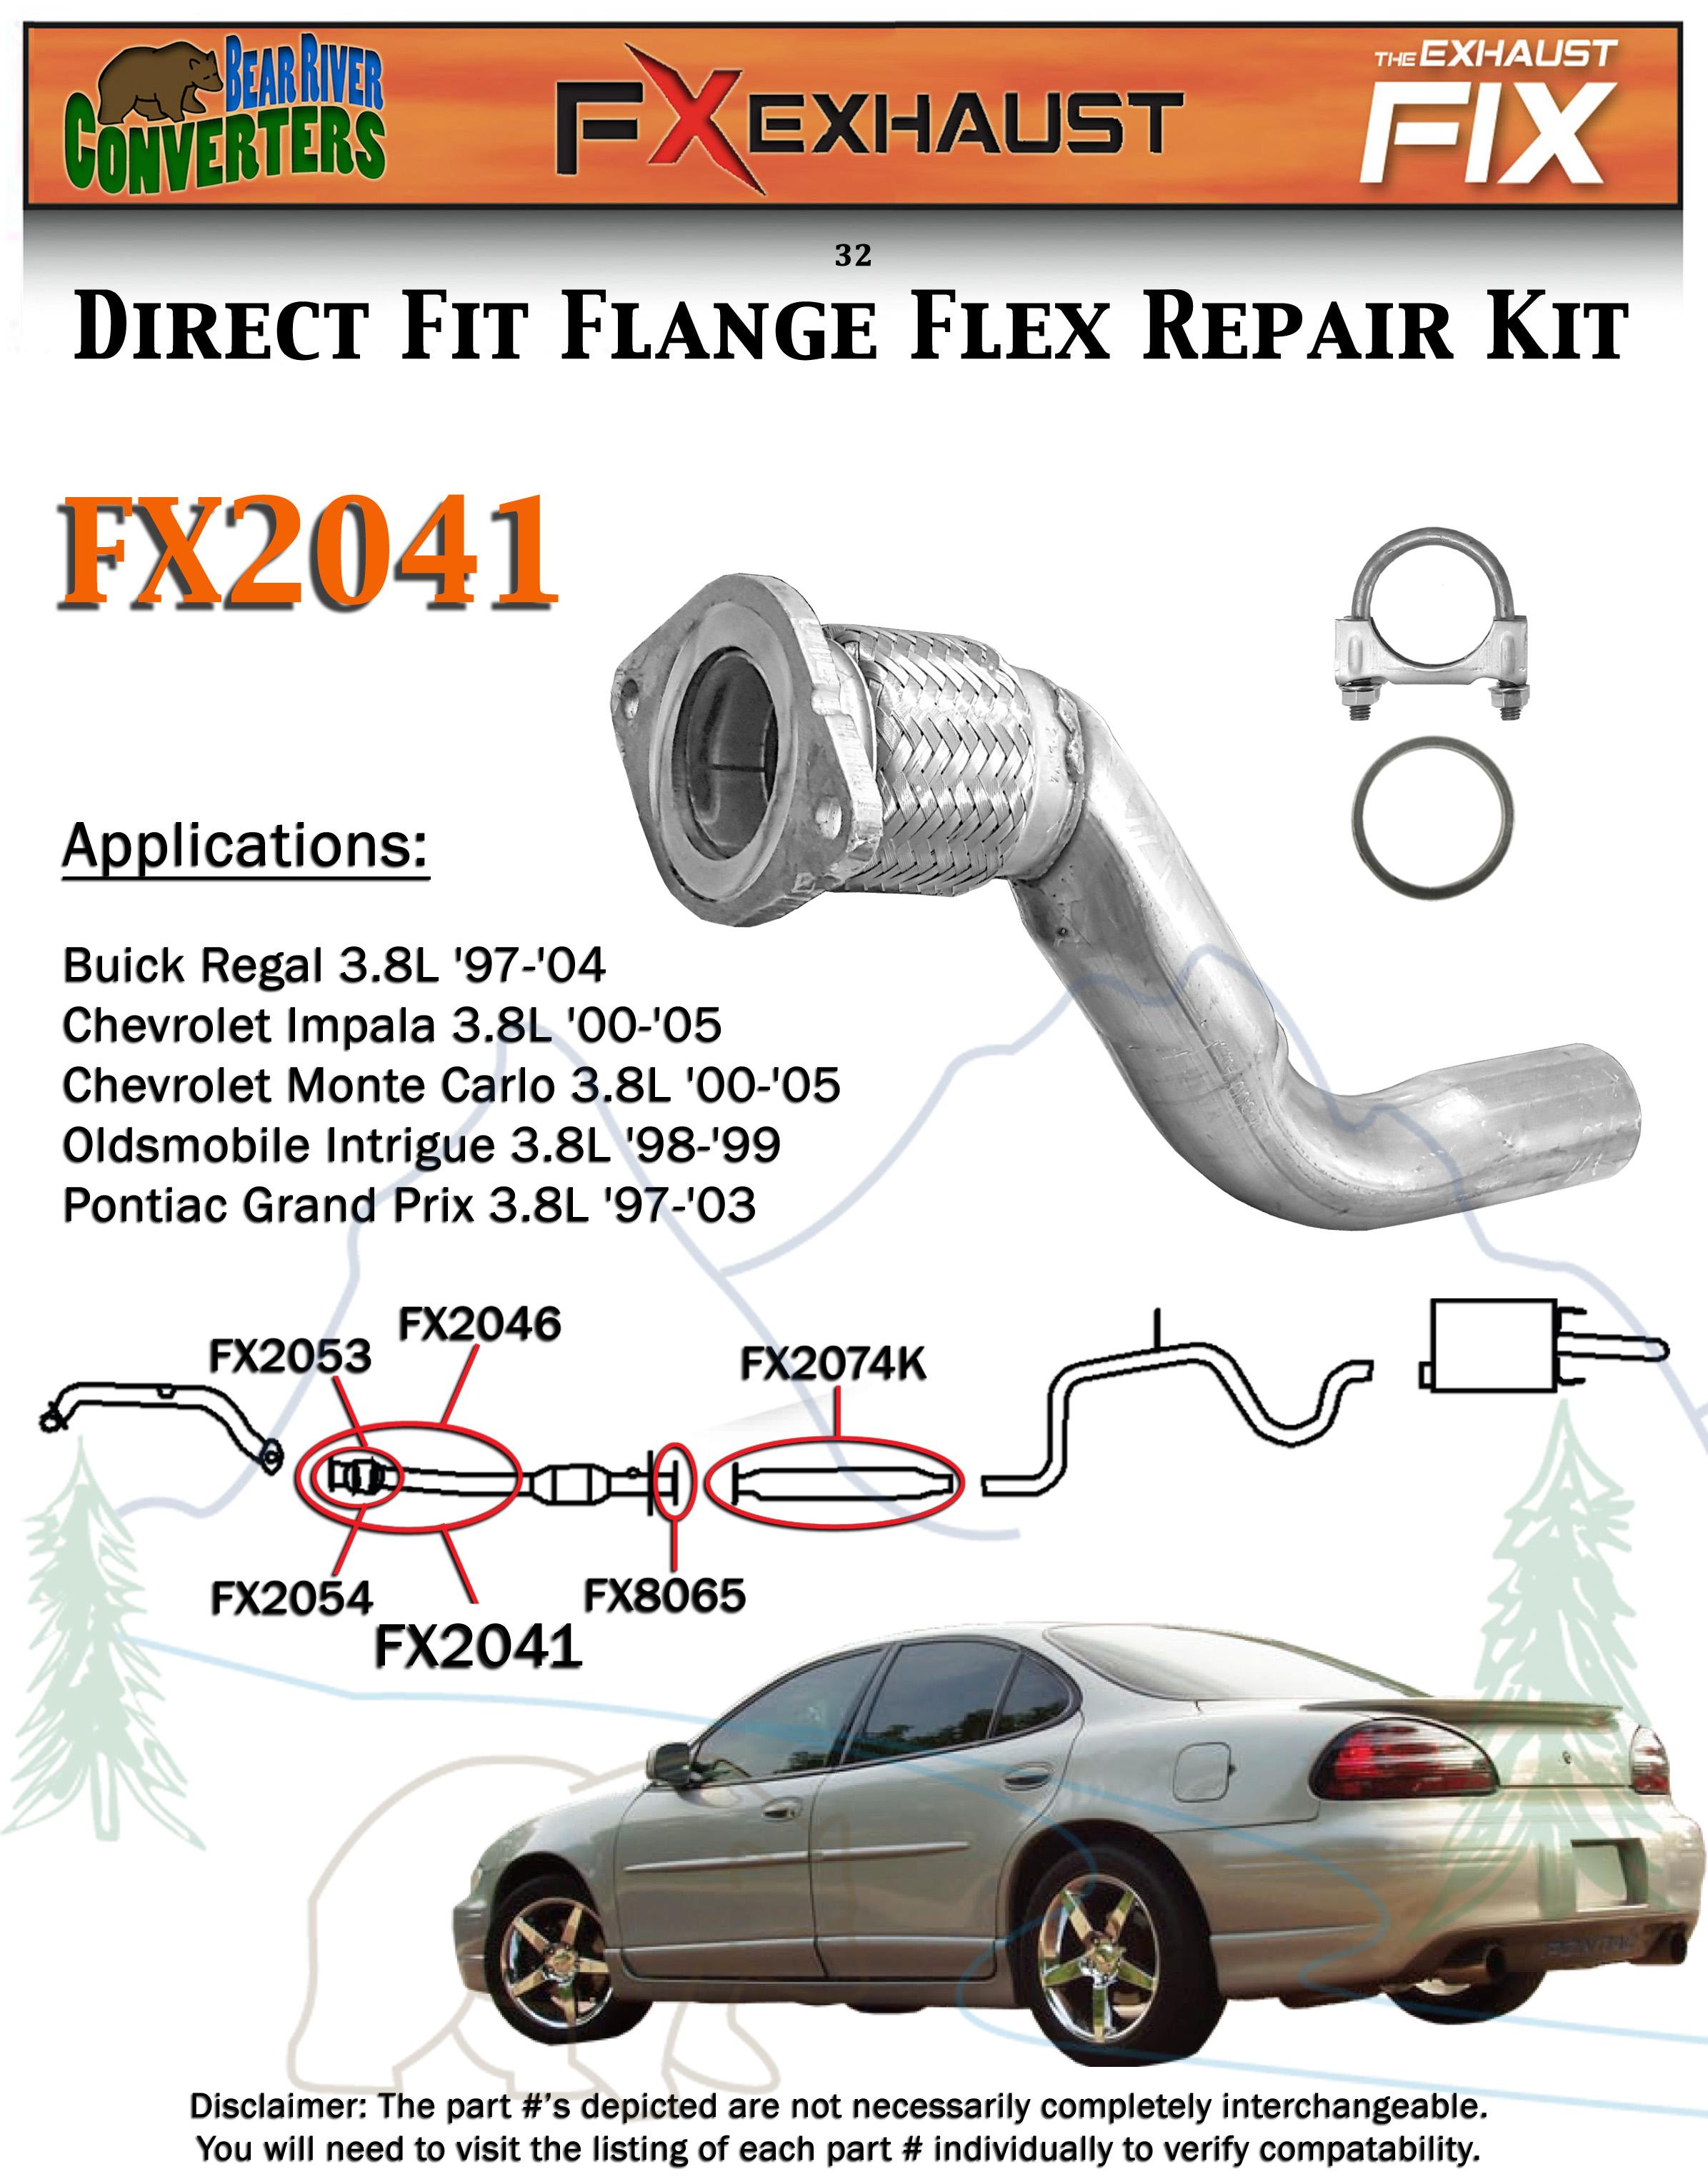 FX2041 Semi Direct Fit Exhaust Flange Repair Flex Pipe Converter